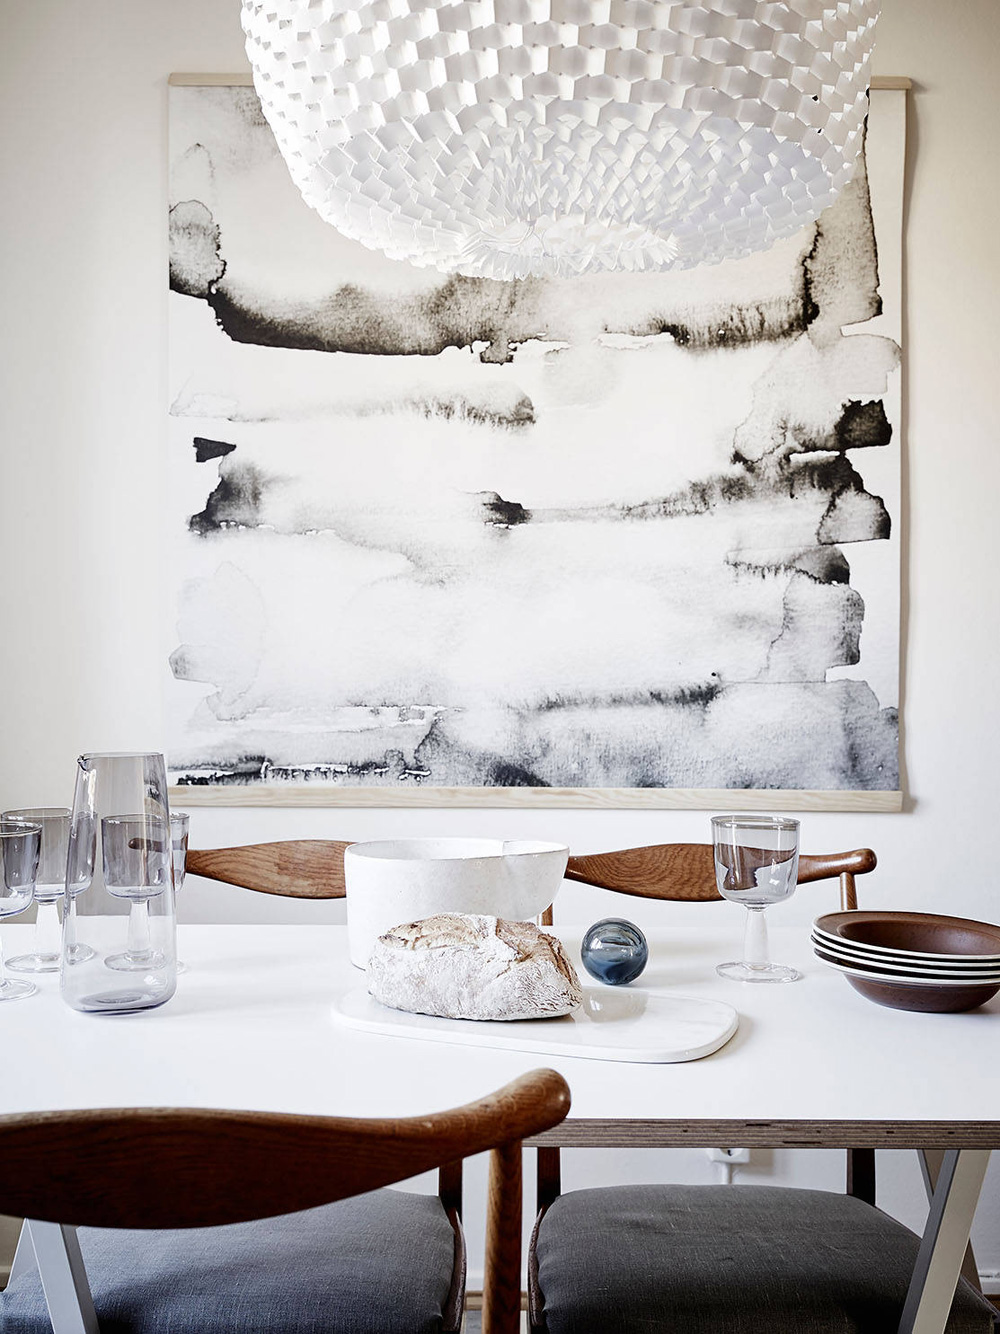 Oracle, Fox, Sunday, Sanctuary, Suncatcher, Scandinavian, Interior, Bright, white, living, room, marble, painting